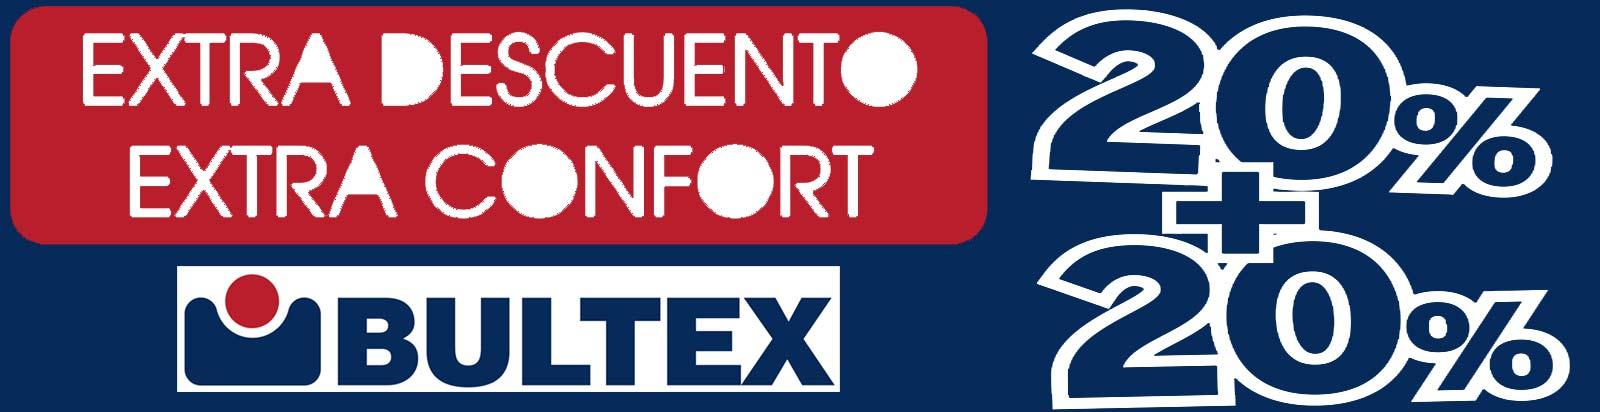 promo Bultex